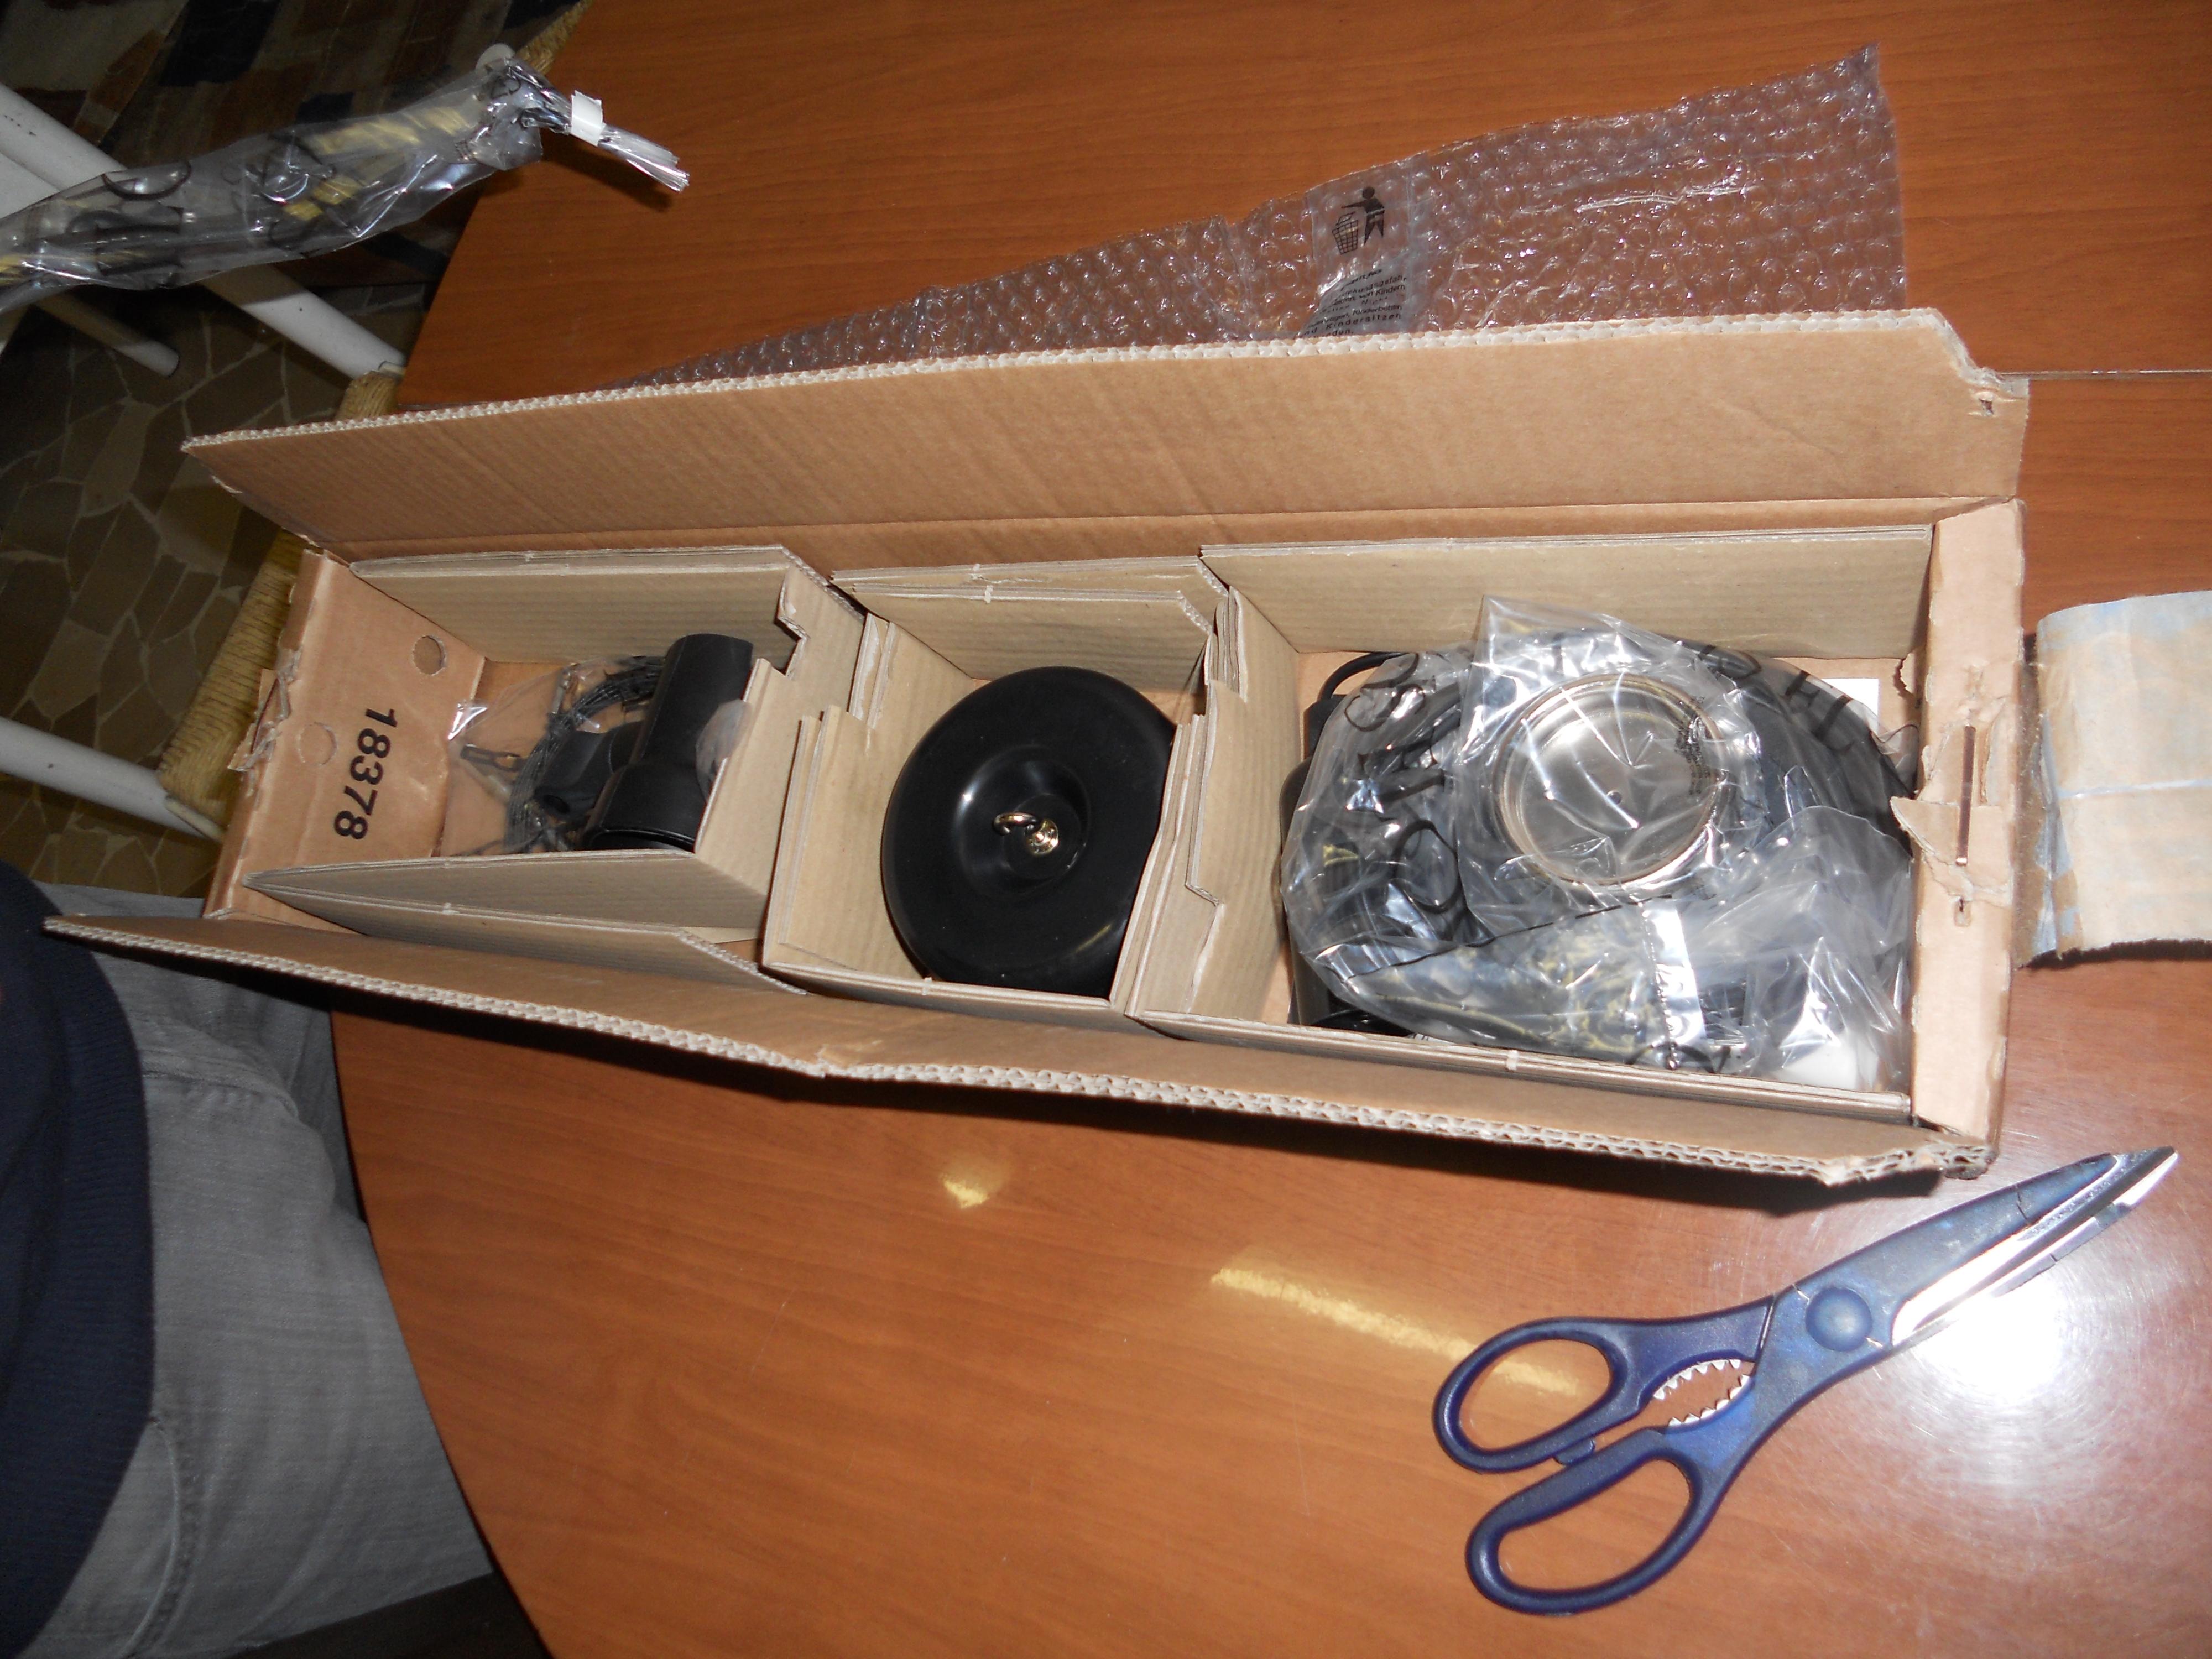 File:01 packaging parentesi lamp flos.jpg wikimedia commons